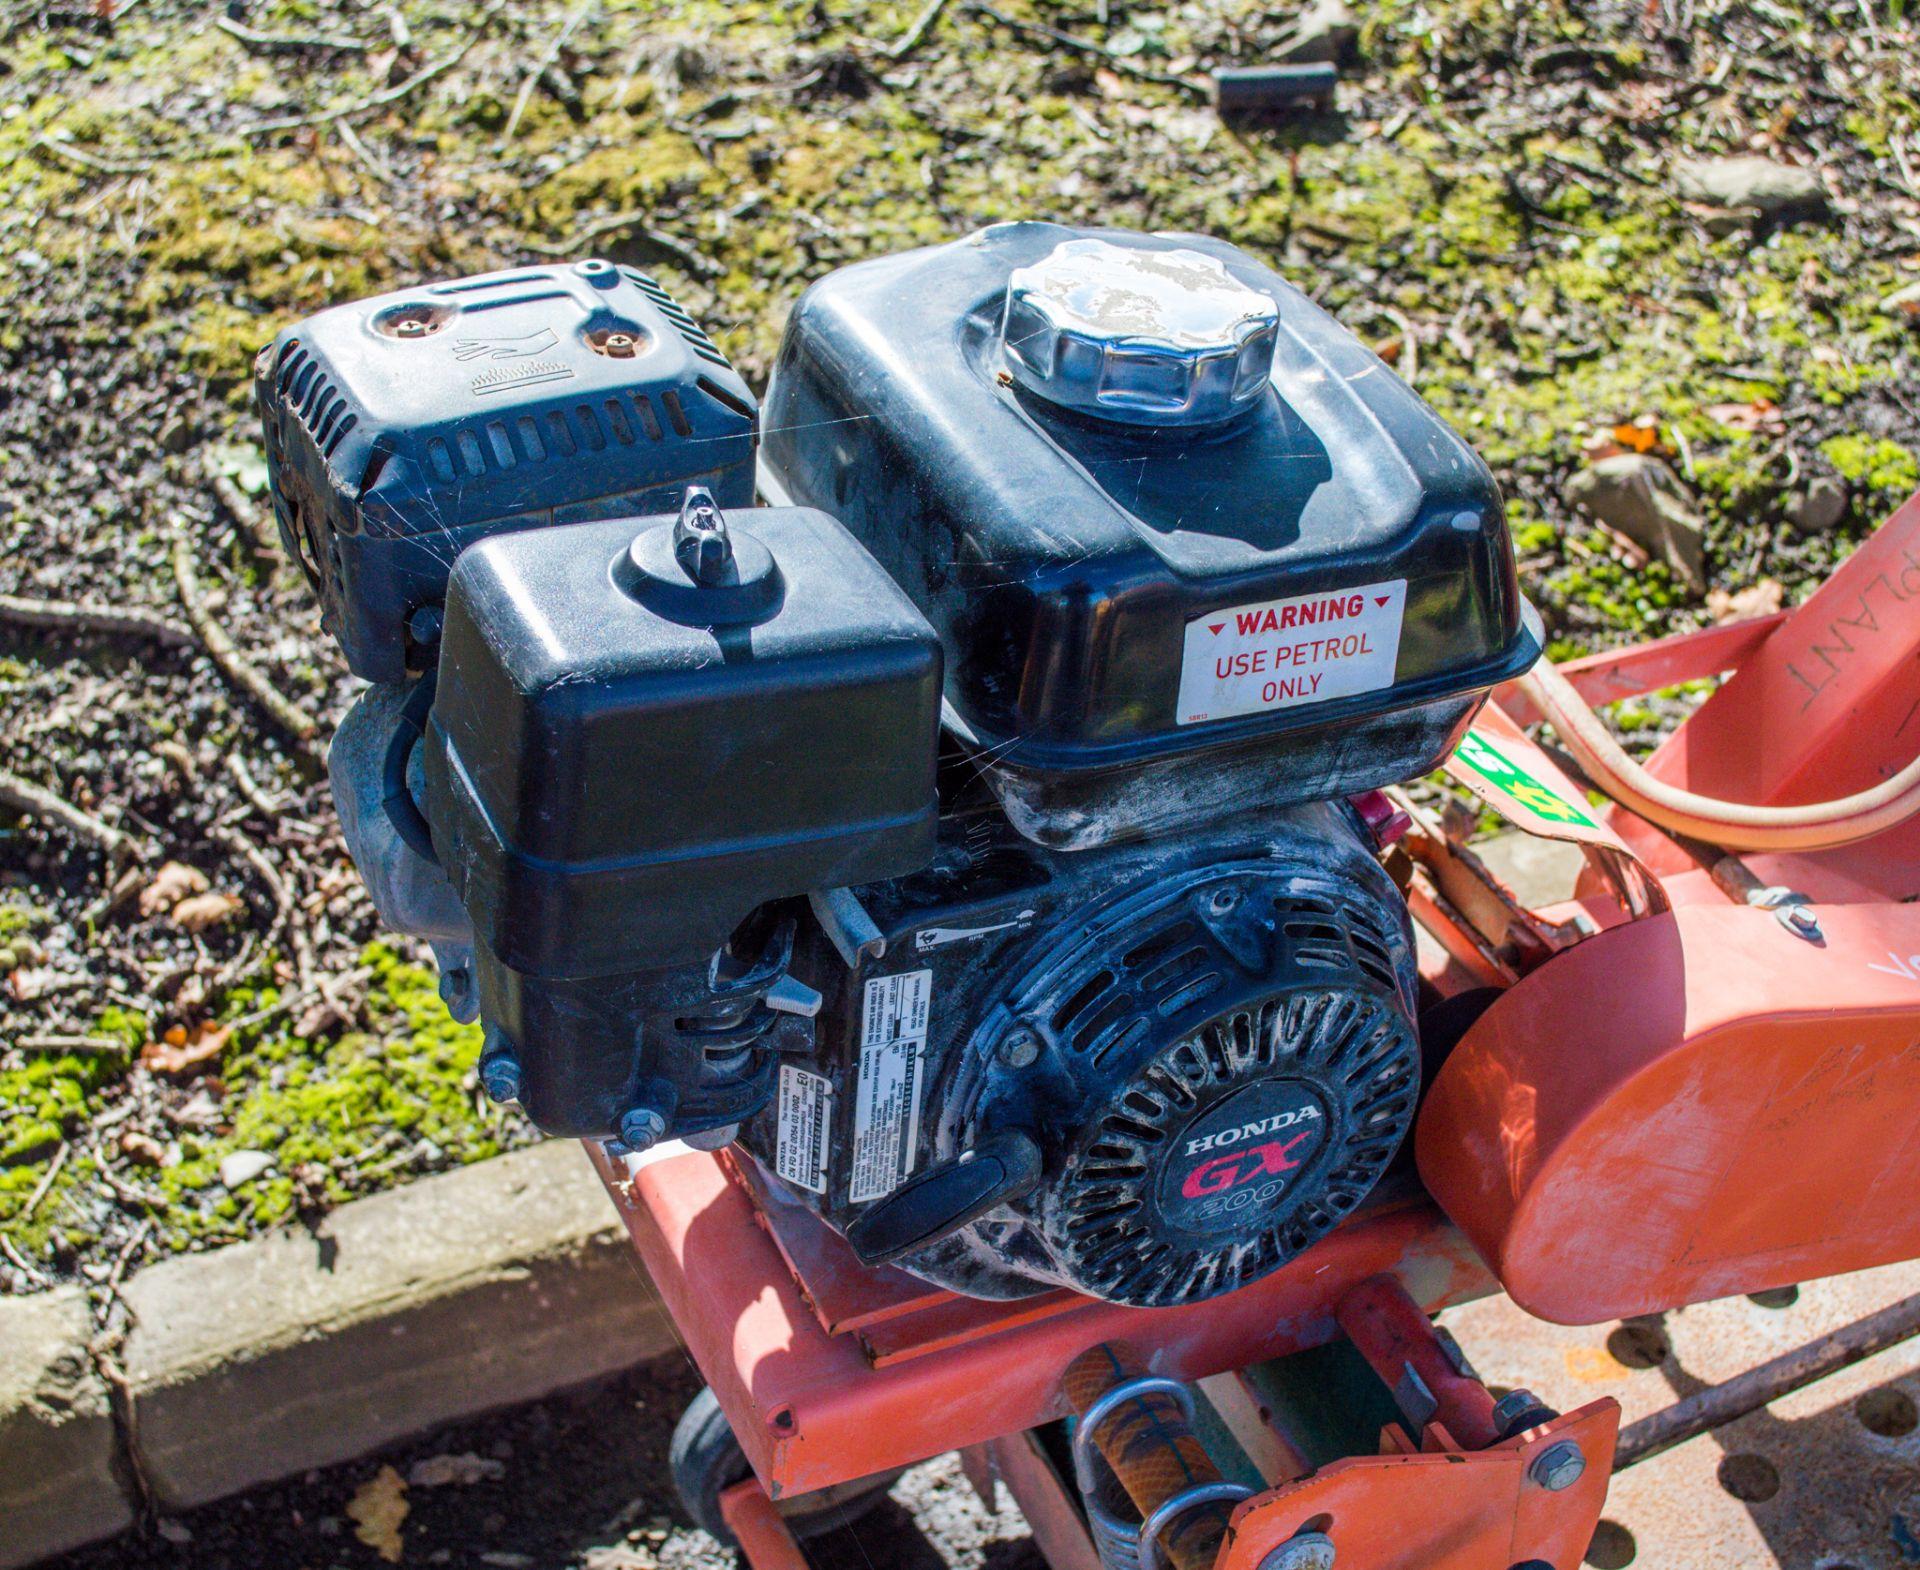 Clipper petrol driven site chop saw A784461 - Image 2 of 2